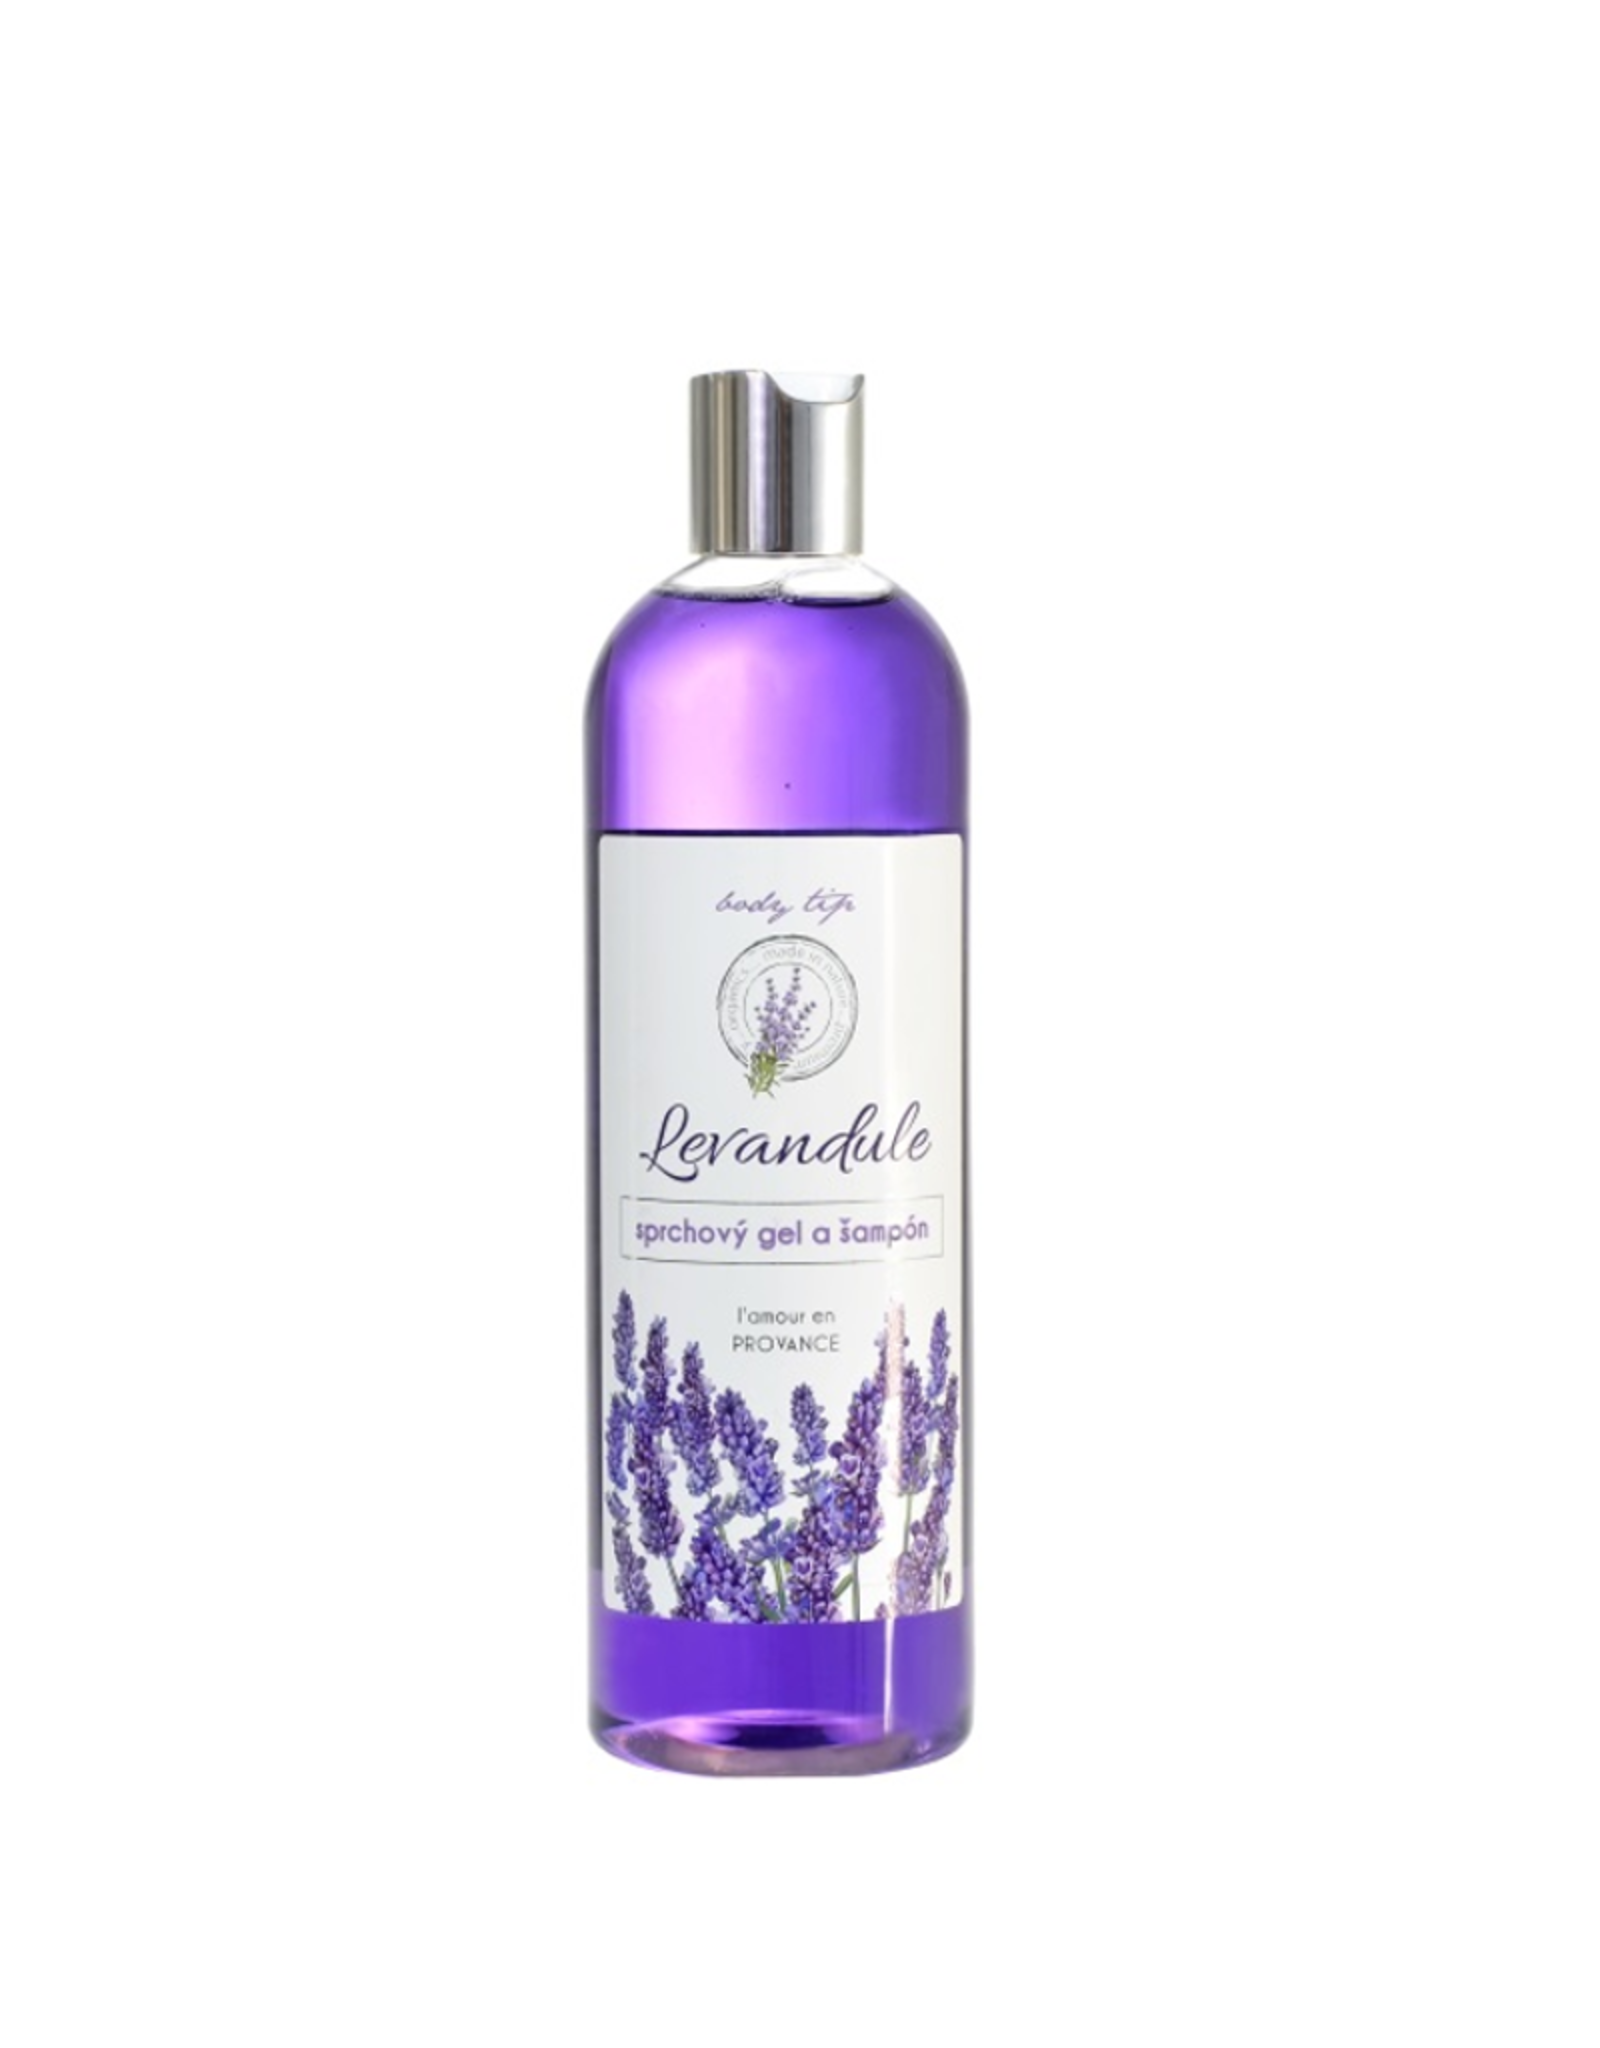 BODY TIP PREMIUM 2 in 1 Douche en Shampoo met Lavendelolie